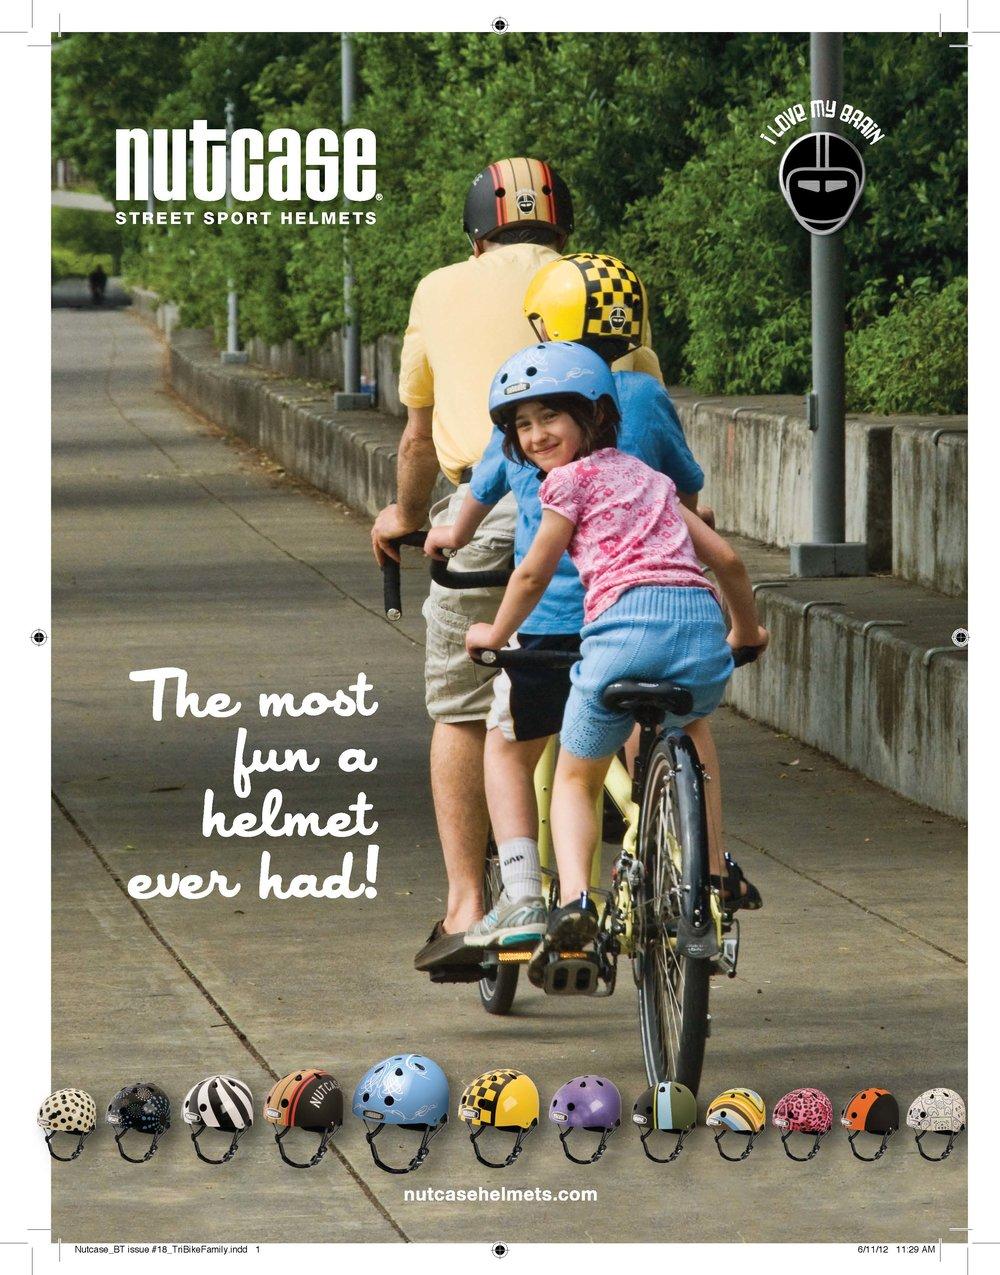 Nutcase_BT issue #18_TriBikeFamily_hi.jpg